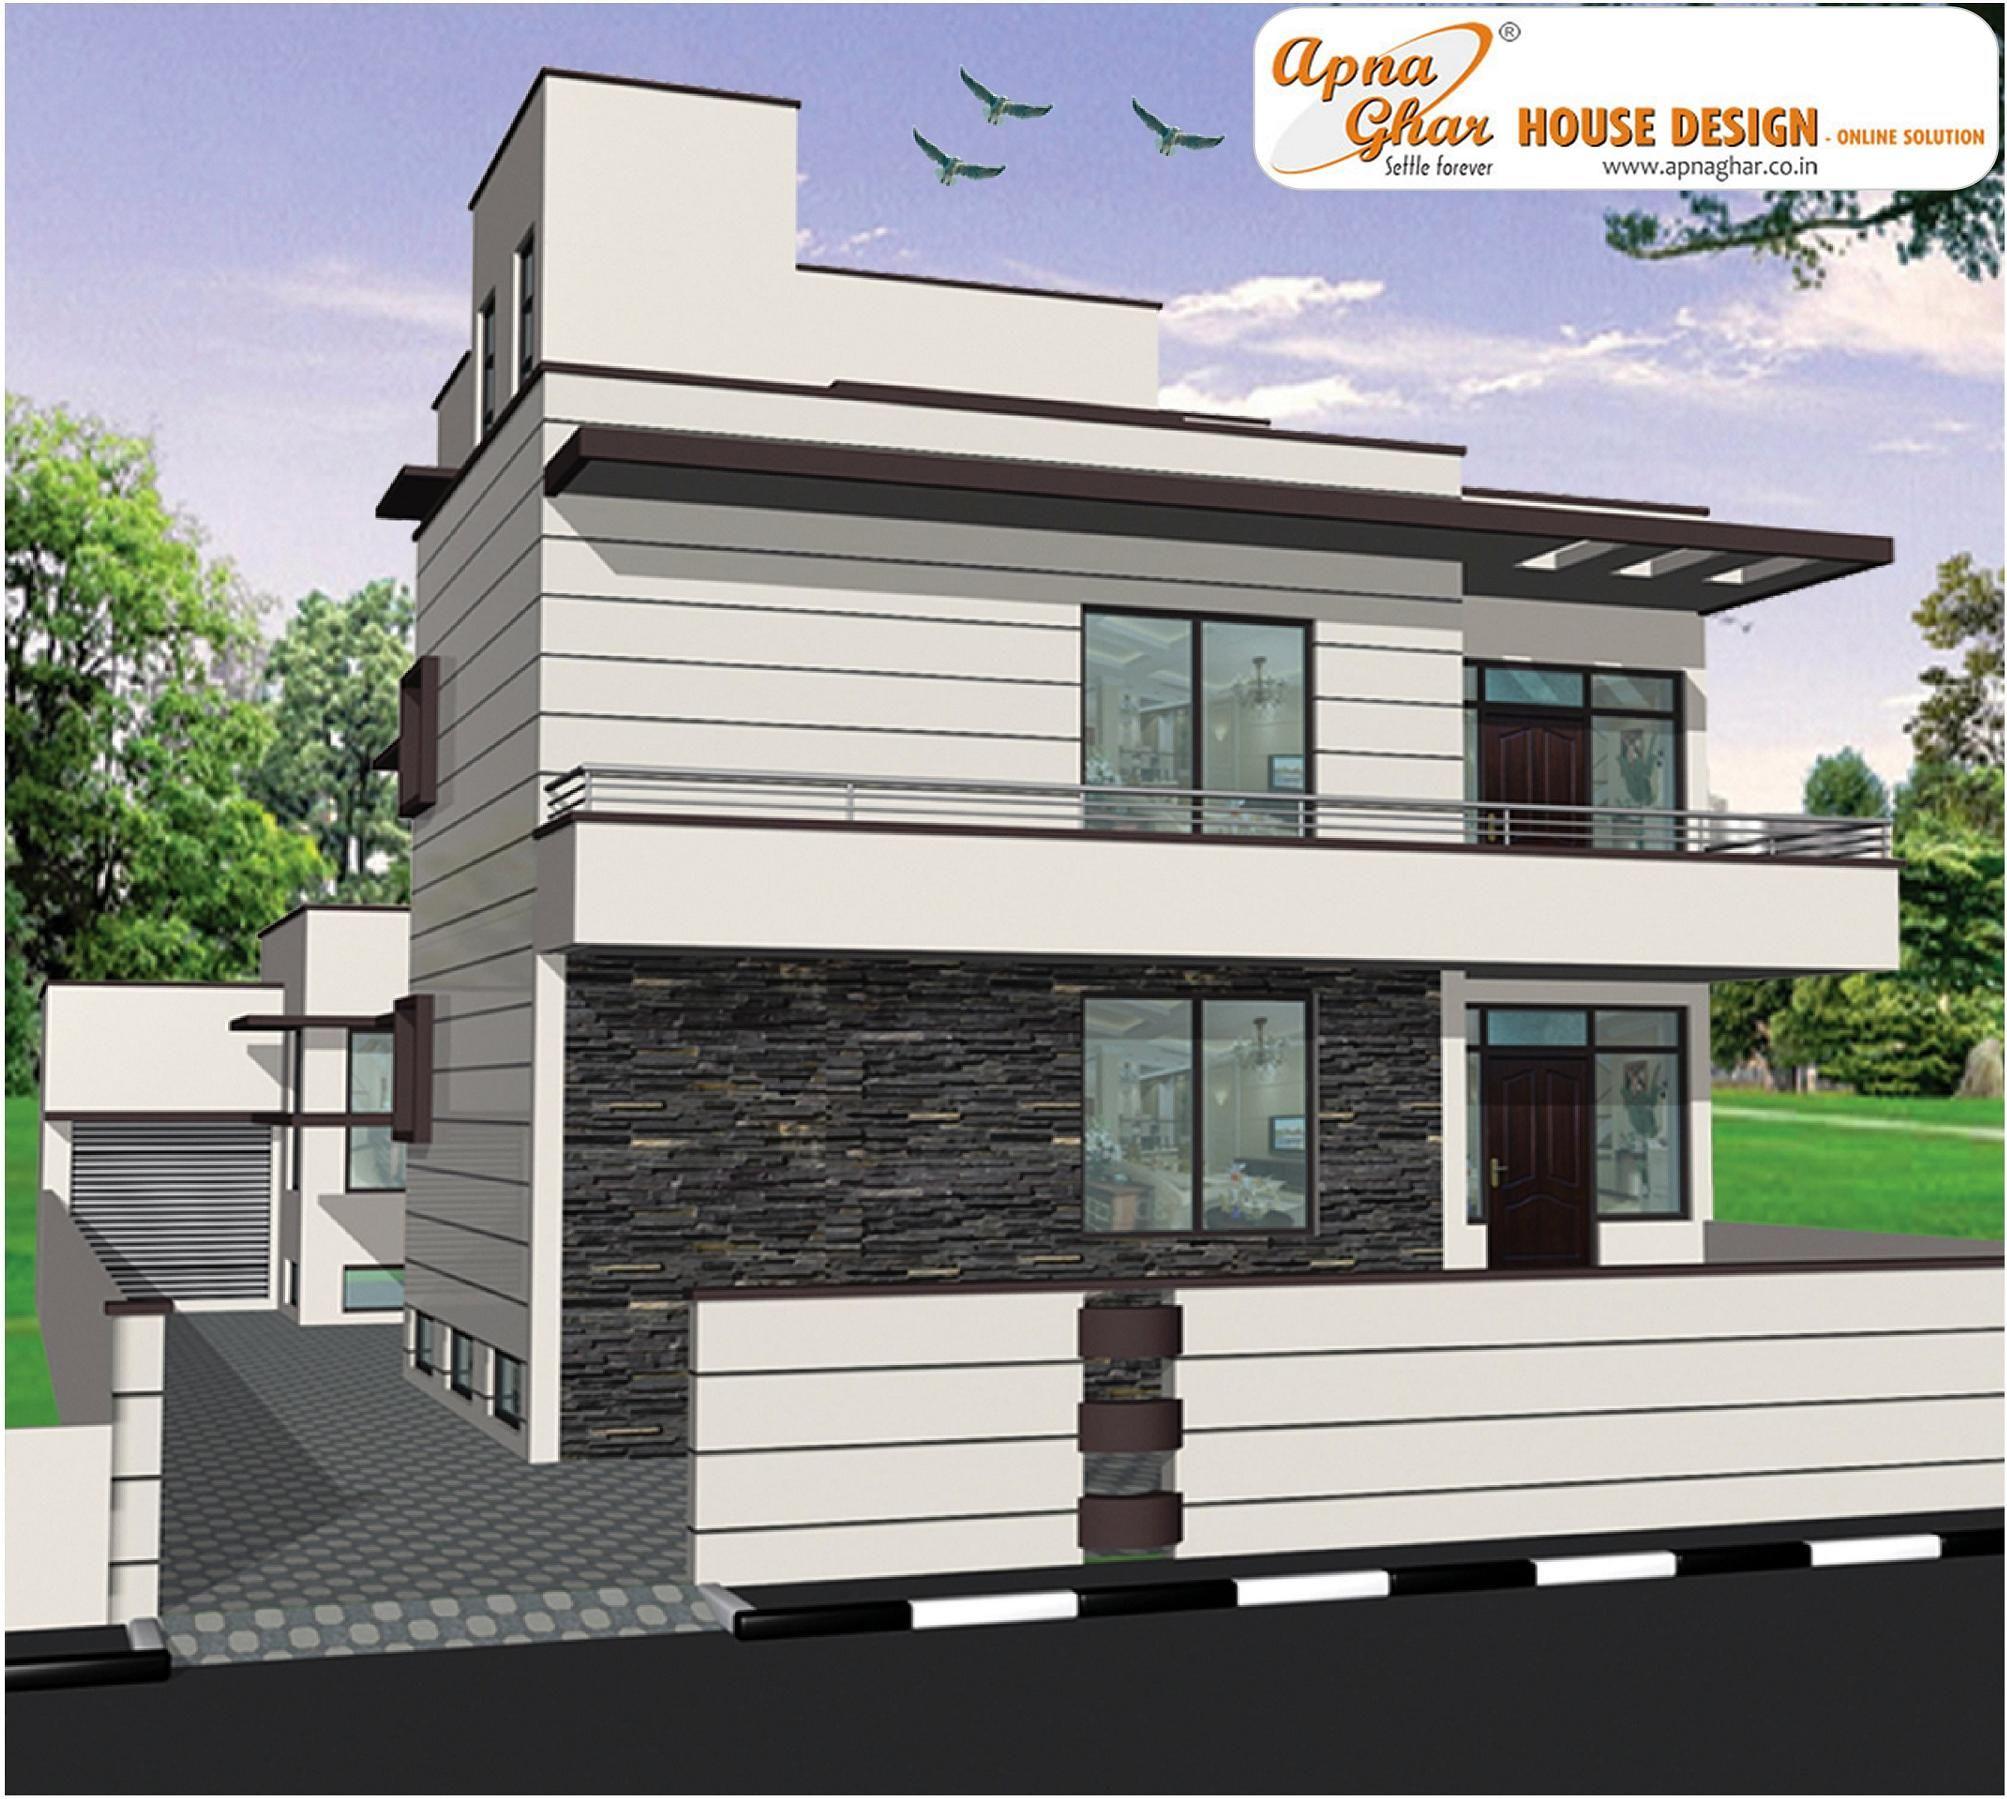 Triplex House Plans Triplex House Design View Plan  Httpapnaghar.co.inhouse